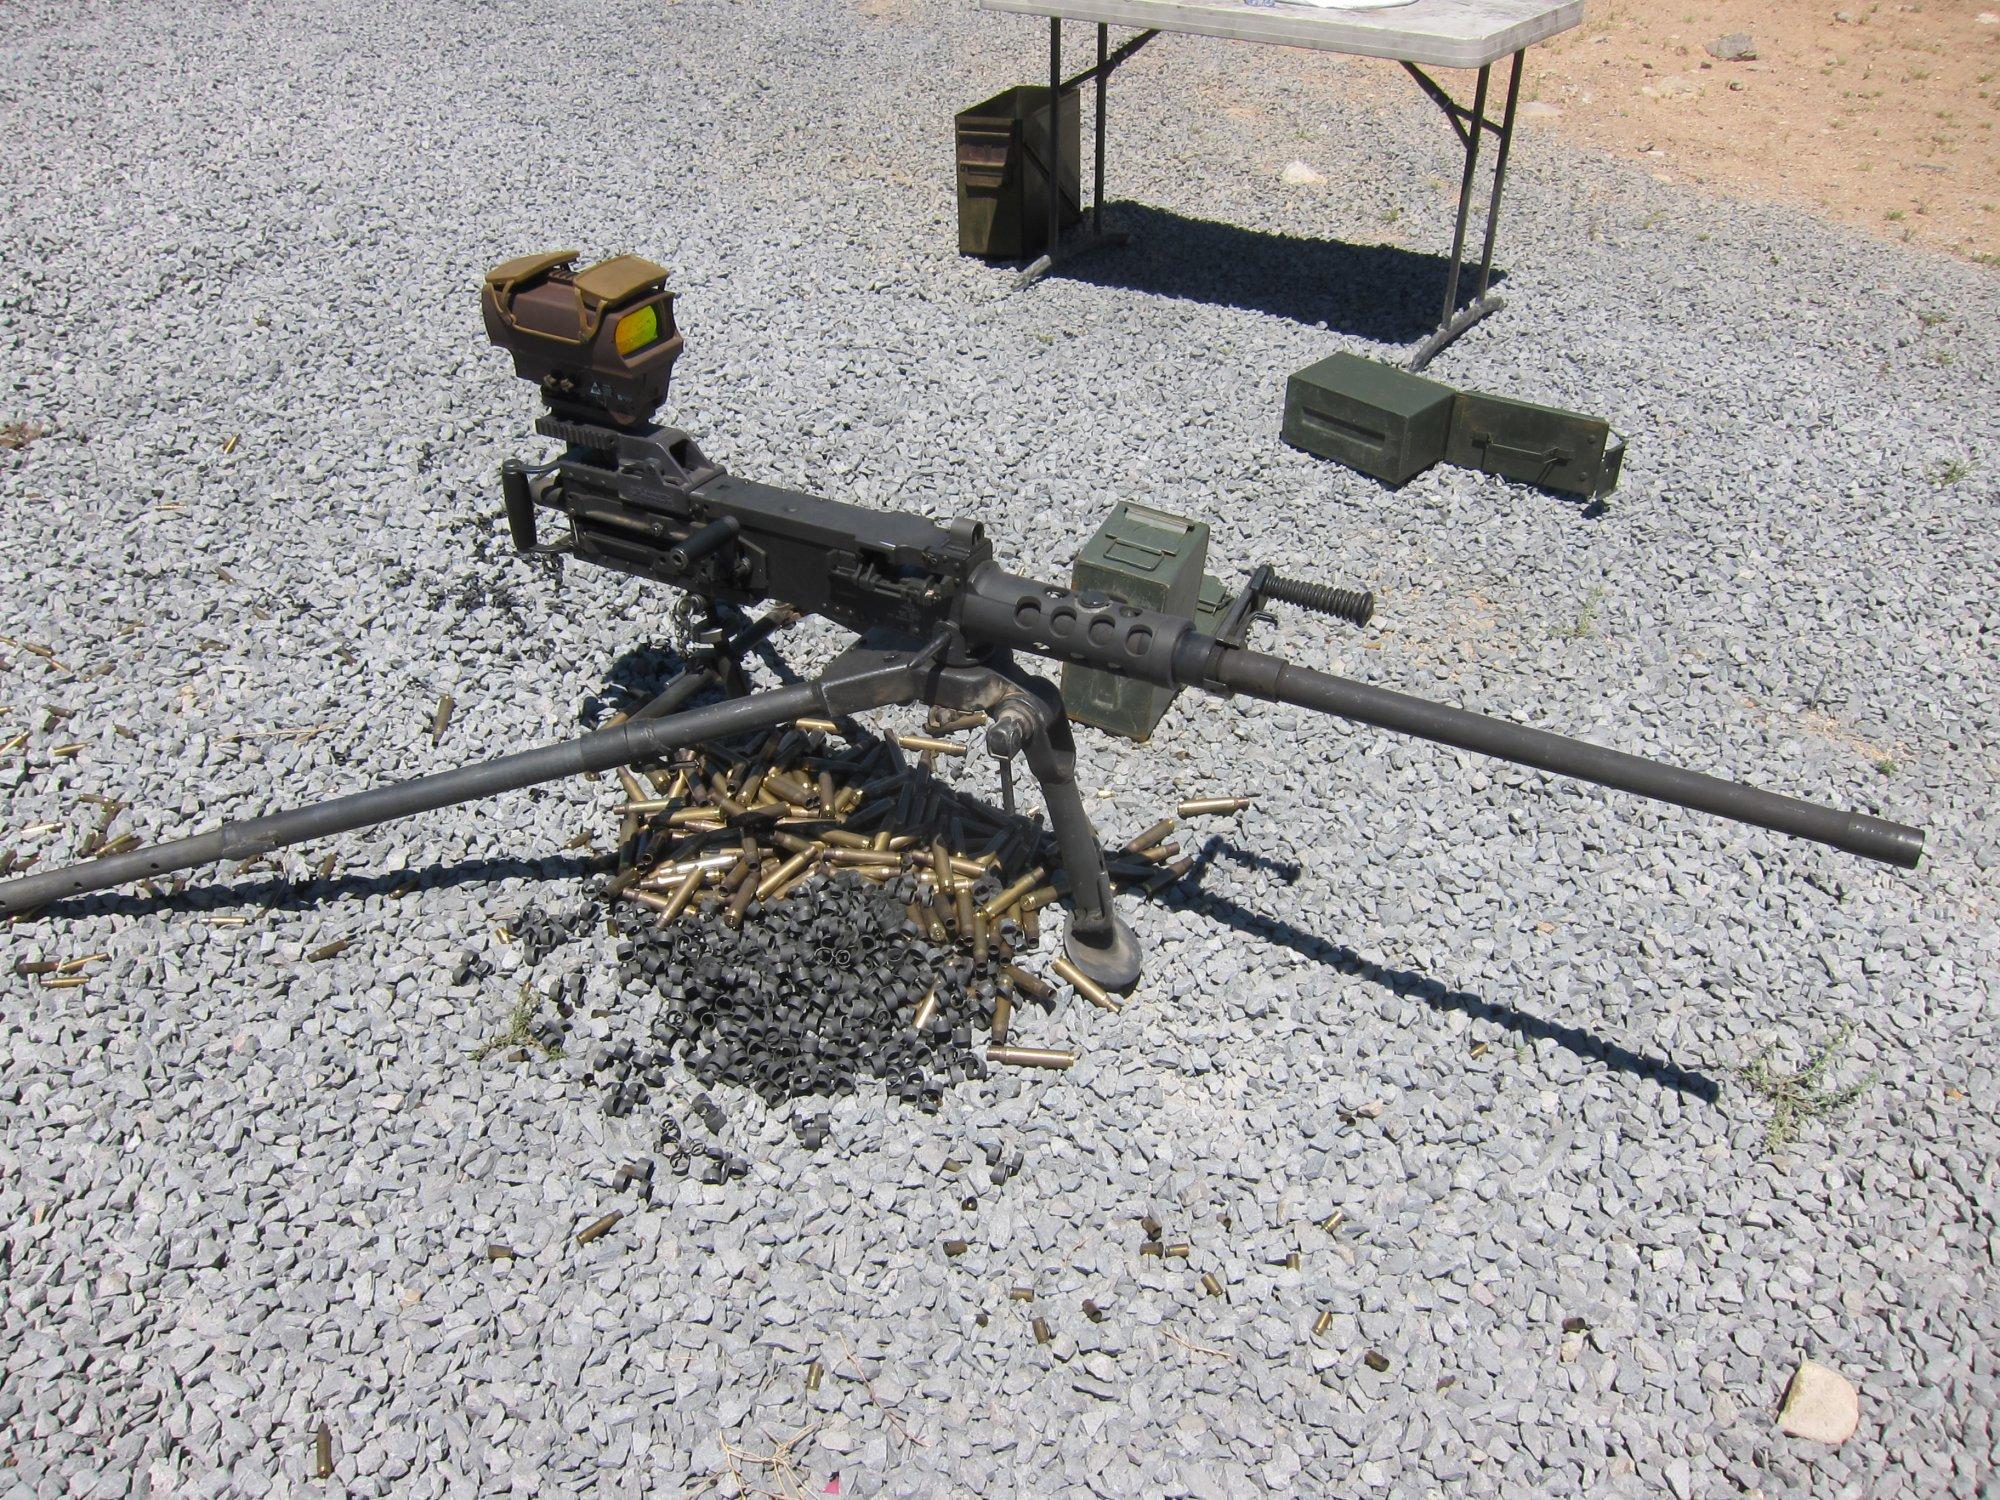 U.S. Ordnance M2HB QCB .50 BMG Heavy Machine Gun HMG David Crane Firing at Range DefenseReview.com DR 4 <!  :en  >U.S. Ordnance M2HB QCB (Quick Change Barrel) Ma Deuce .50 BMG Heavy Machine Gun (HMG) Equipped with Raytheon ELCAN SpecterHR Wide View Dual Red Dot Optical Gunsight Gets Test Fired at the Range (Video!)<!  :  >